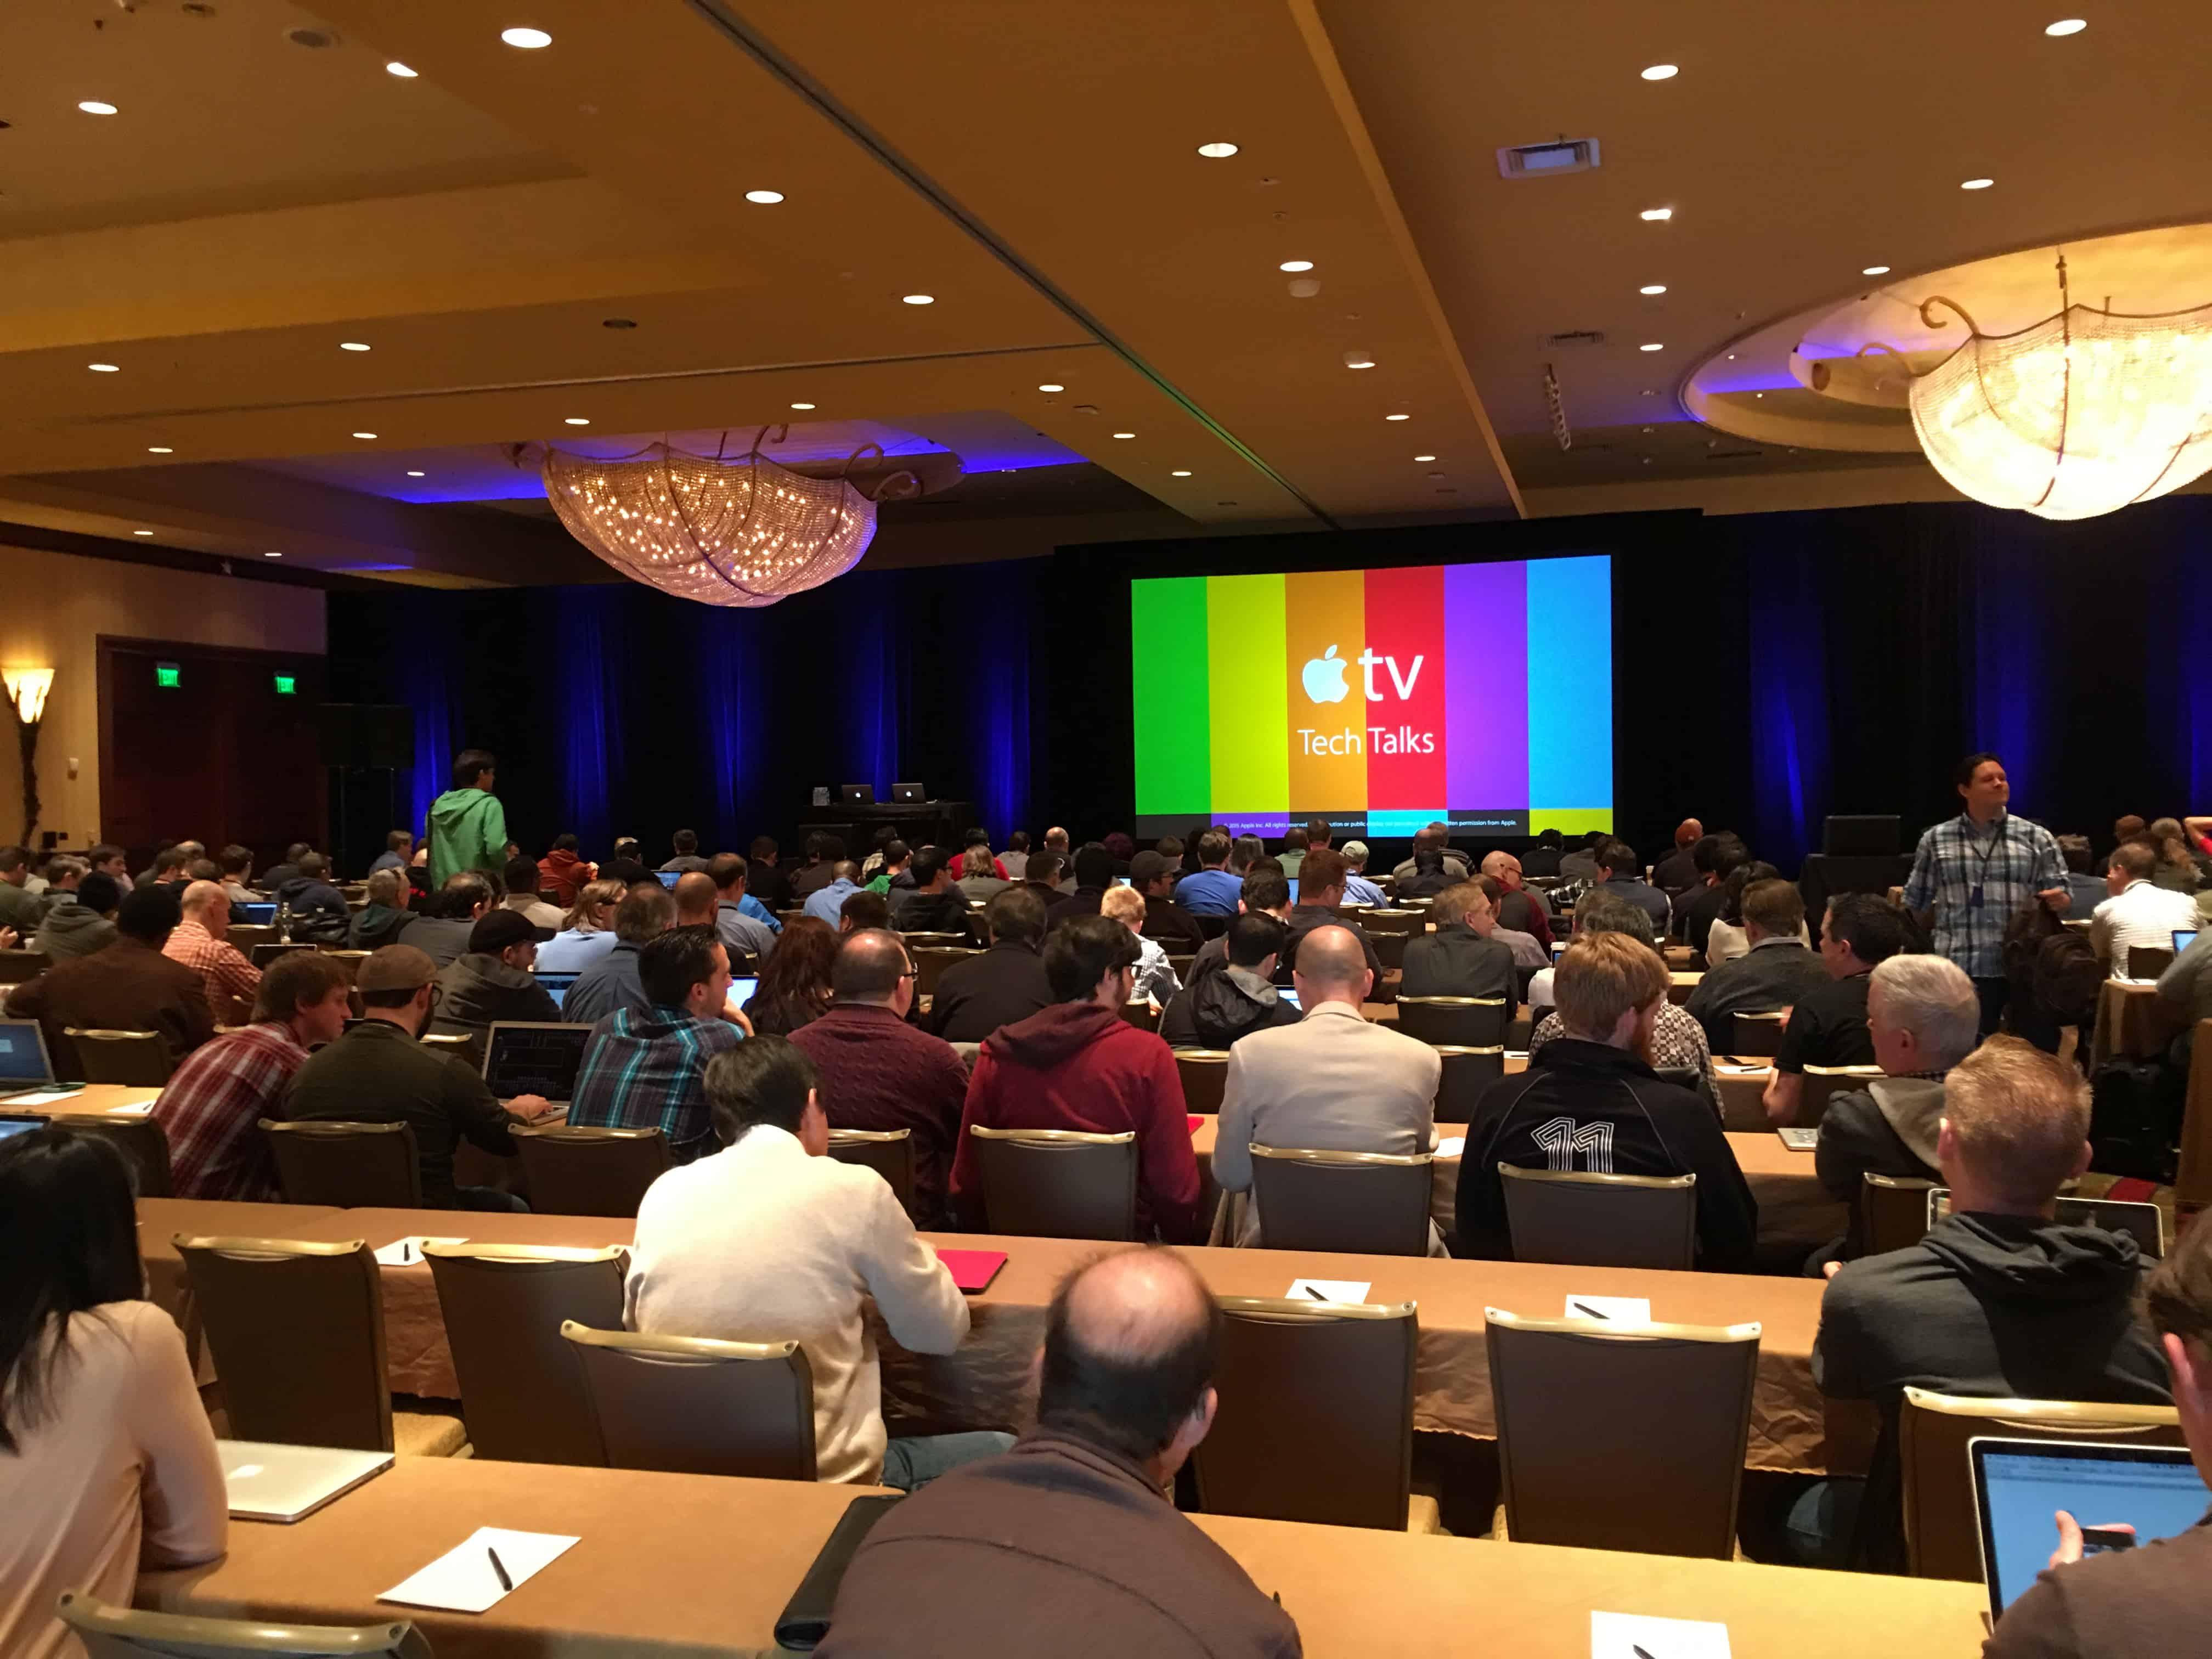 2015 Apple TV Tech Talk Report